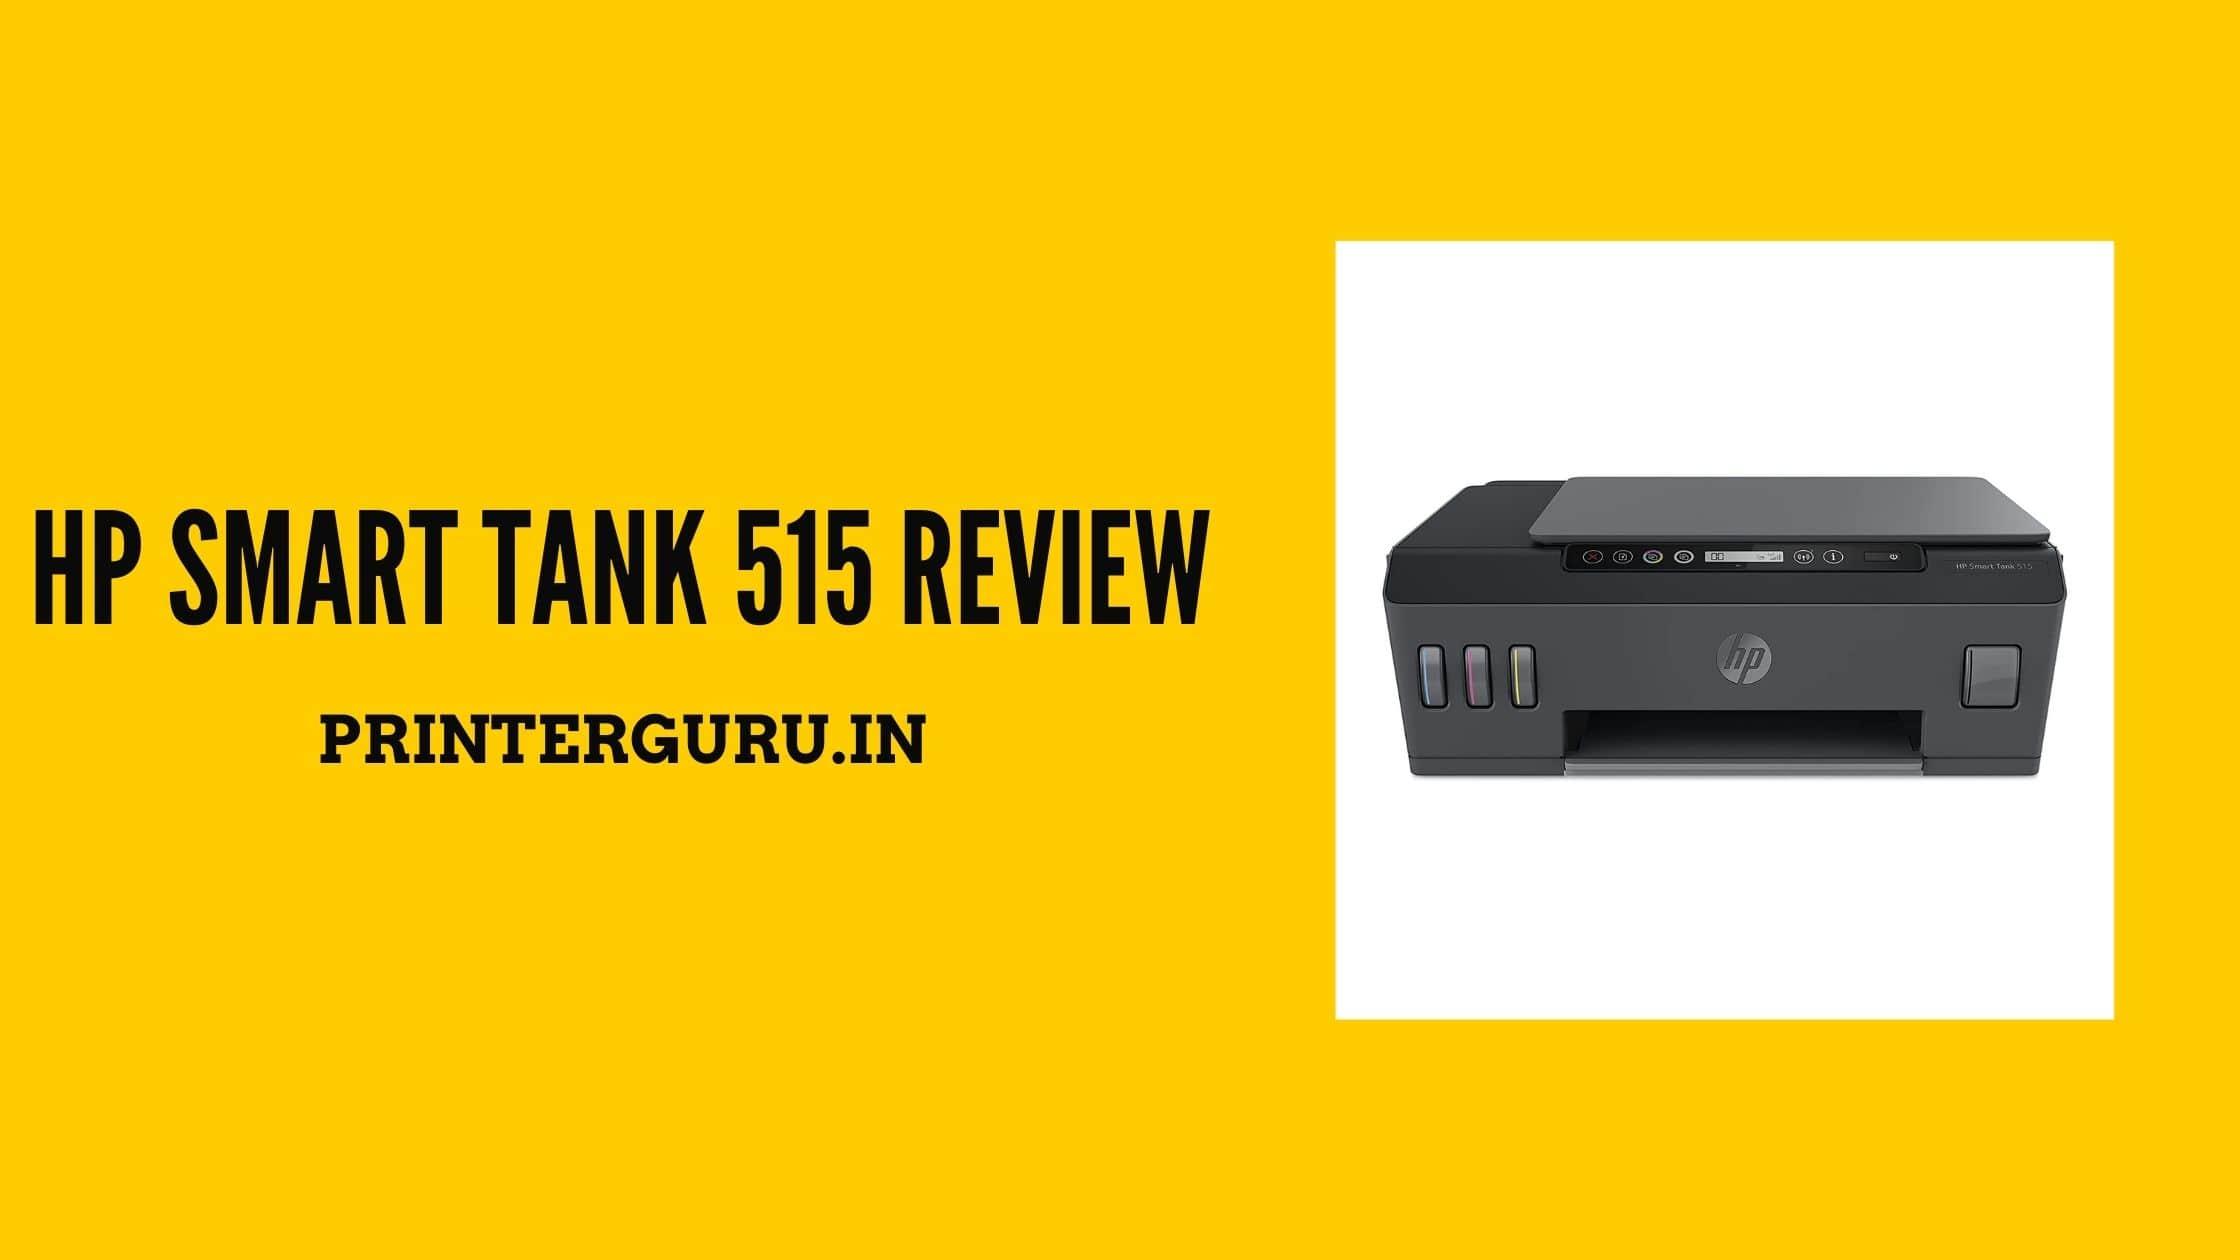 HP Smart Tank 515 Review